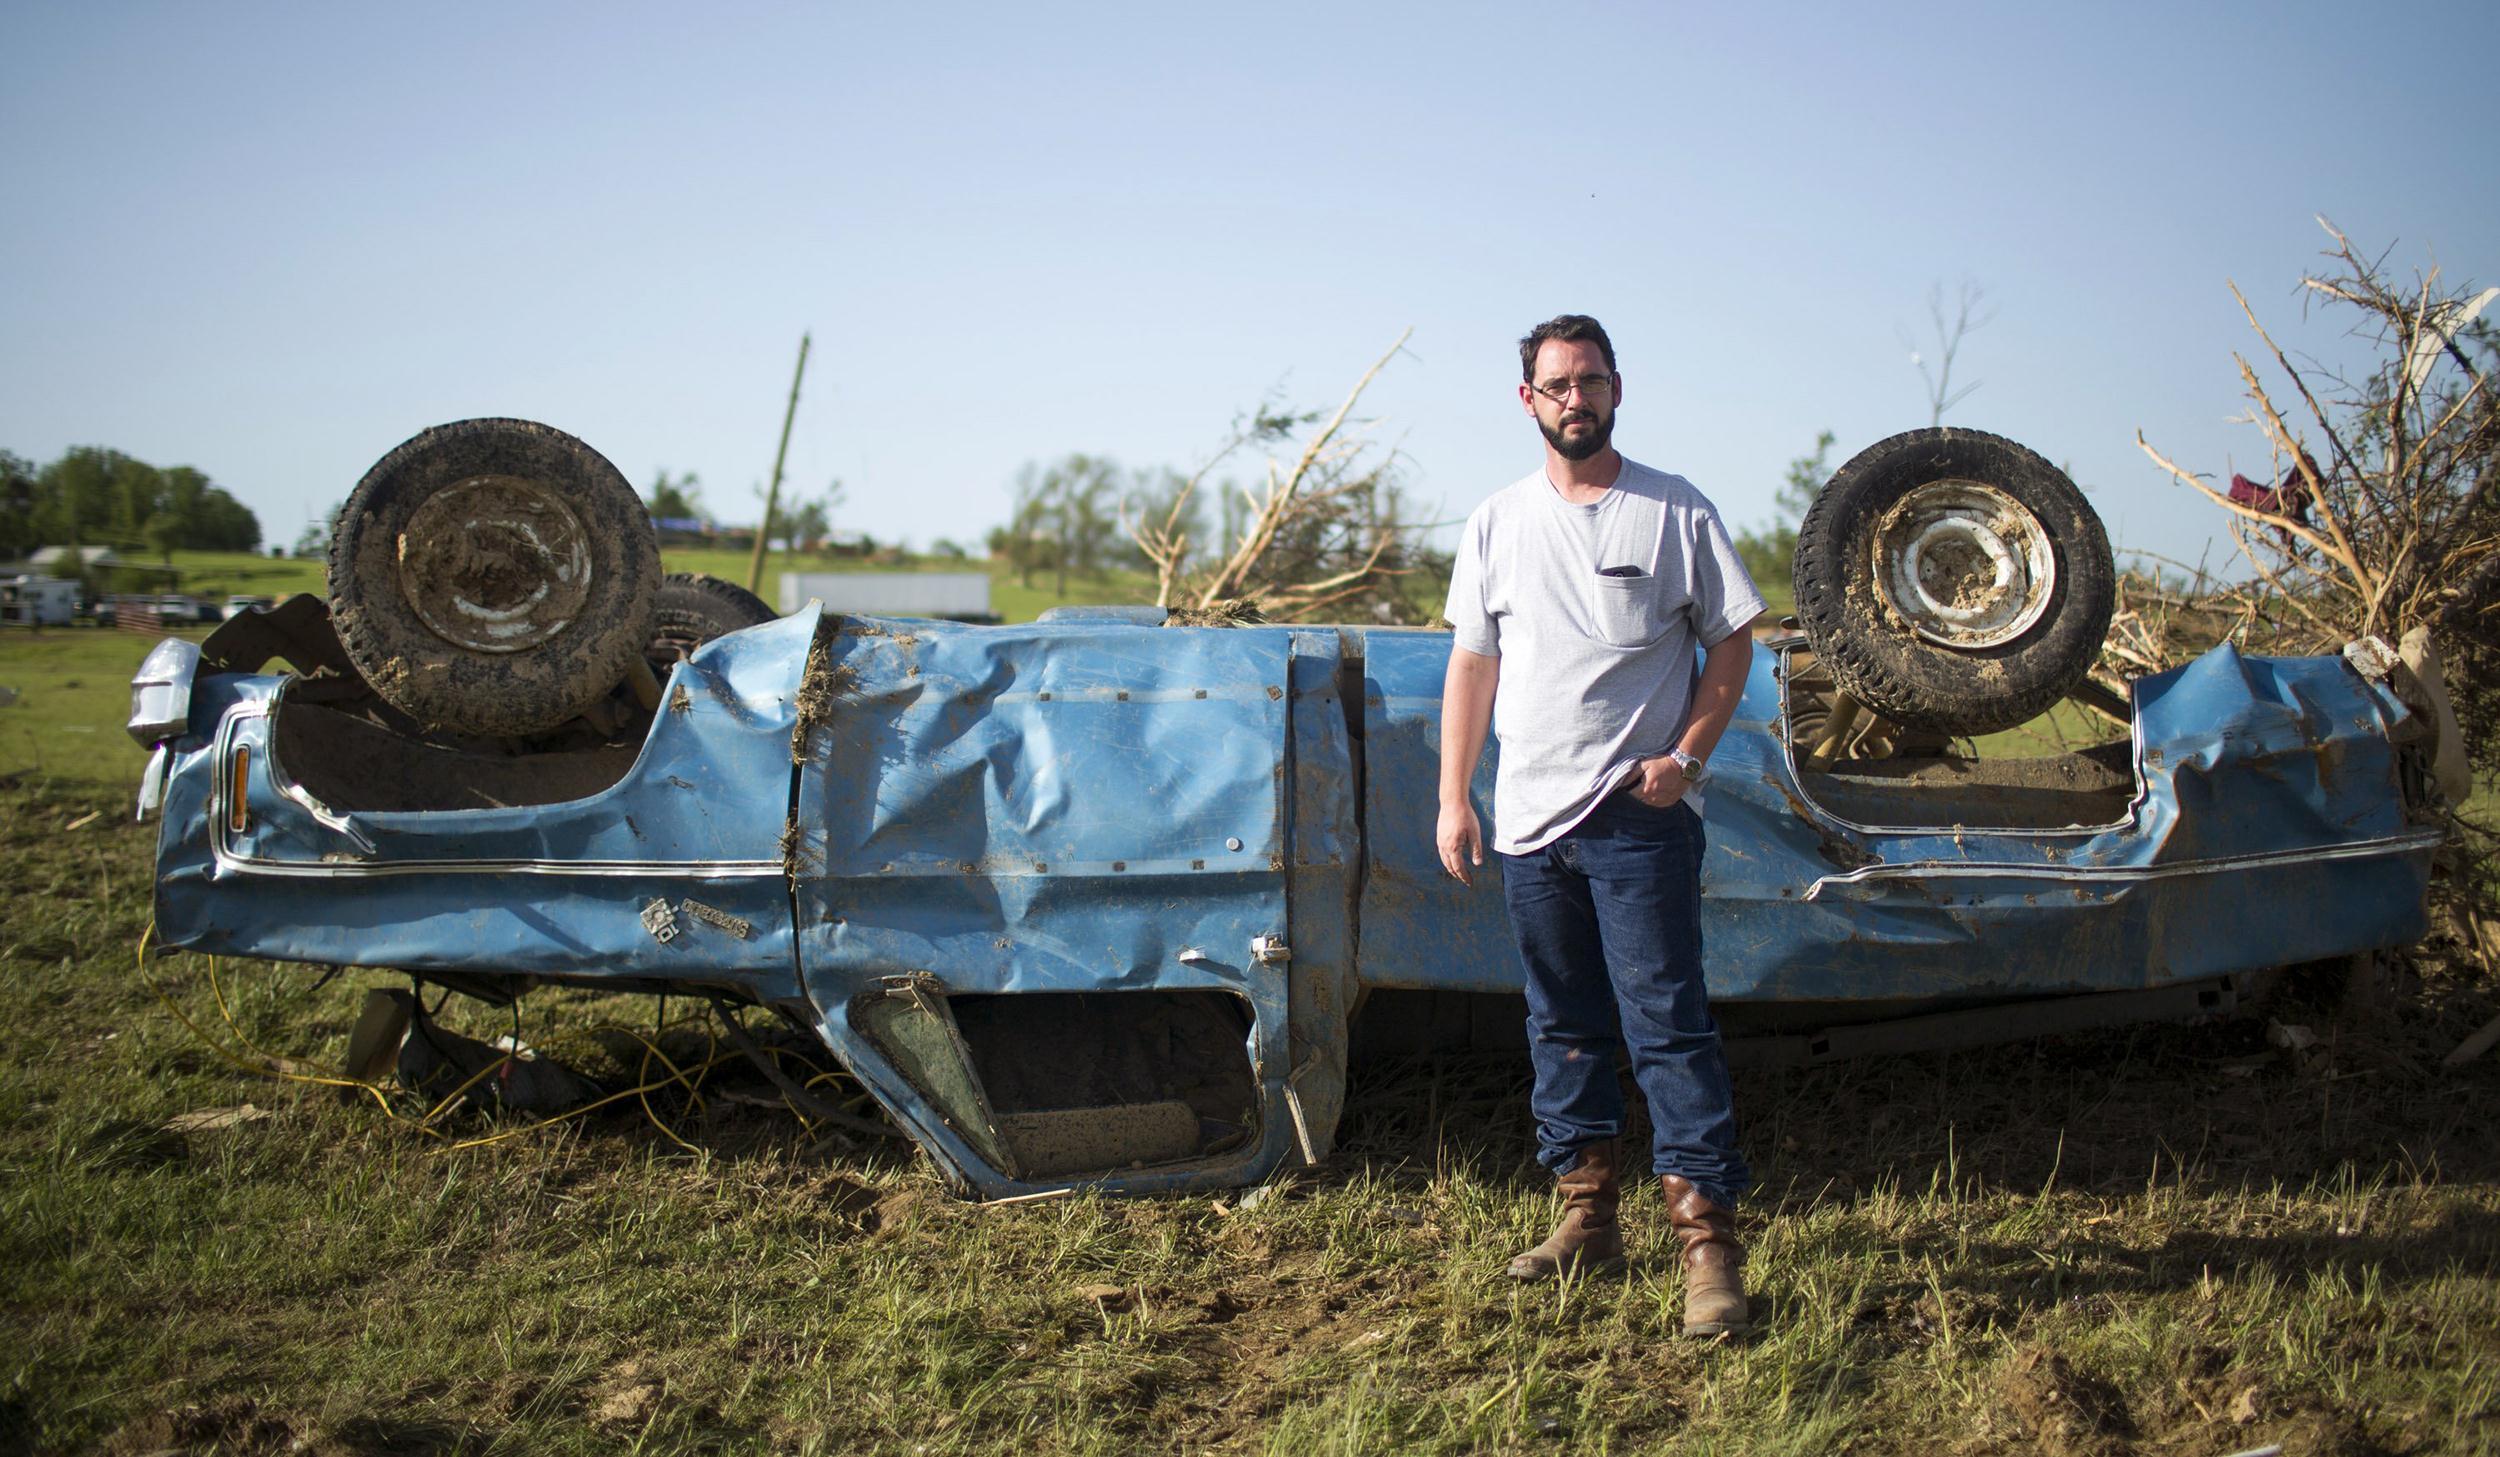 Image: Wade Lentz stands next to his wrecked 1980 Chevy Silverado in Vilonia, Ark.